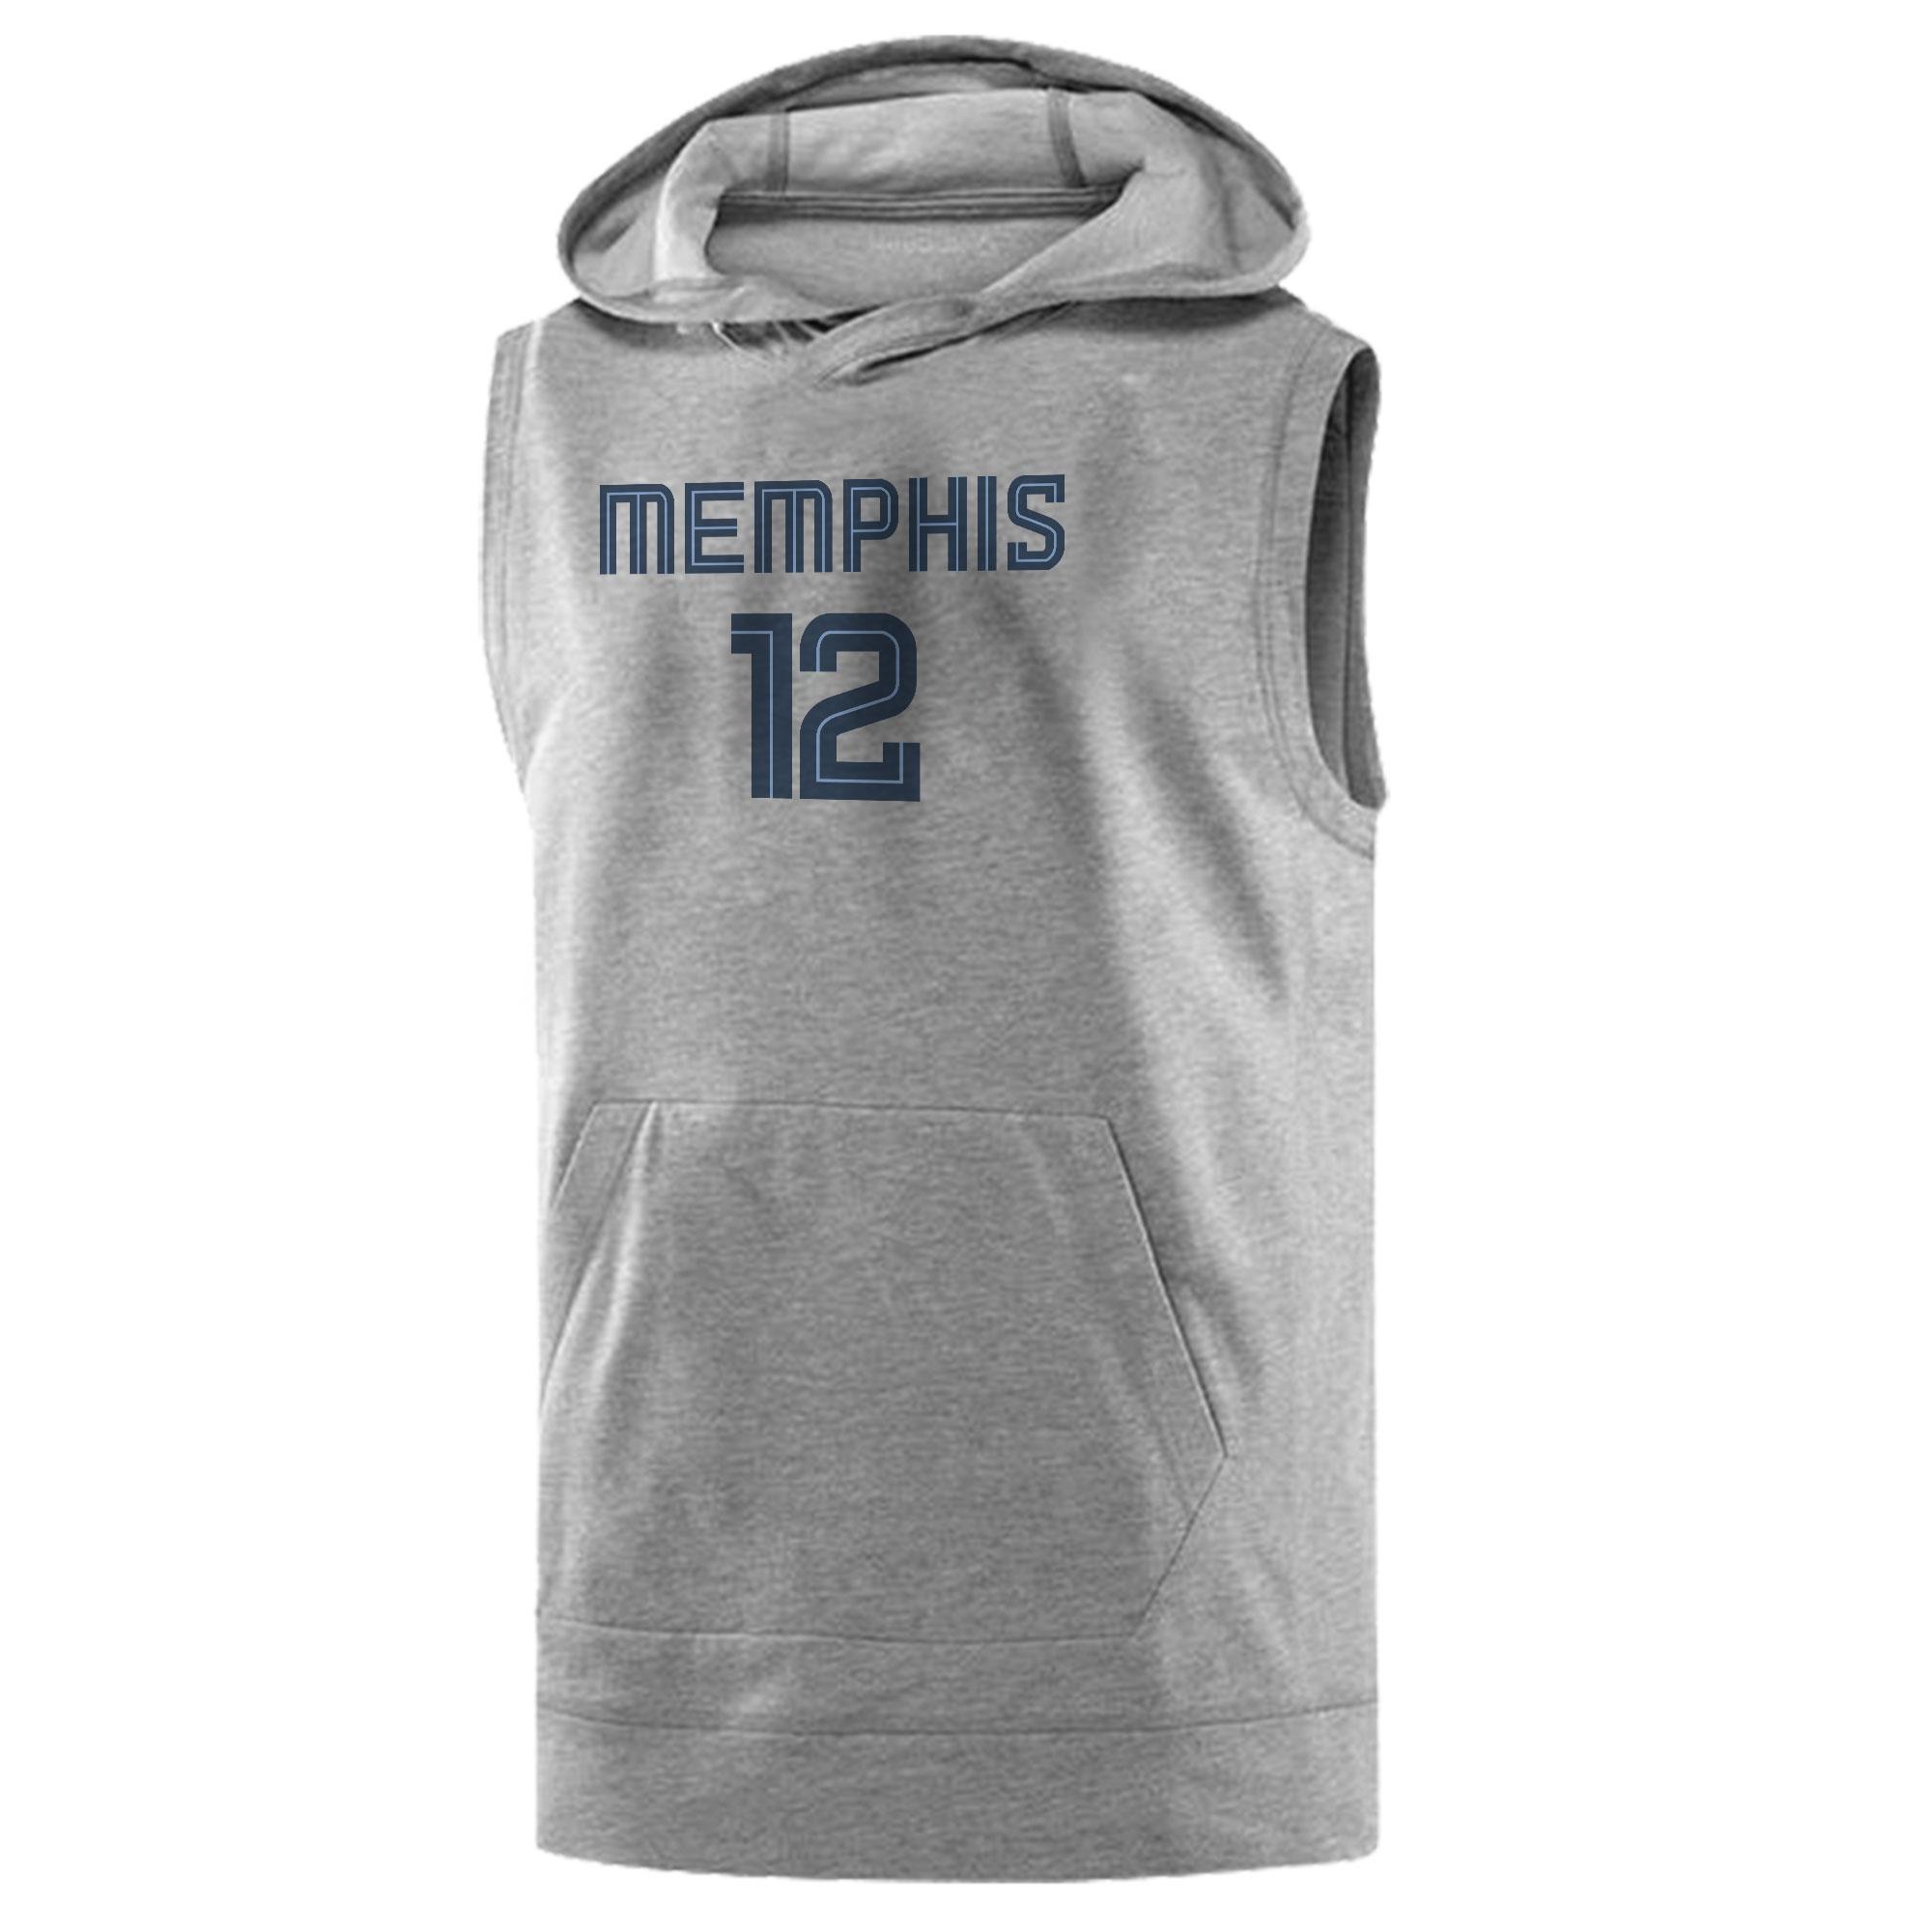 Memphis Grizzlies Ja Morant Sleeveless (KLS-WHT-414-JA-MORANT)